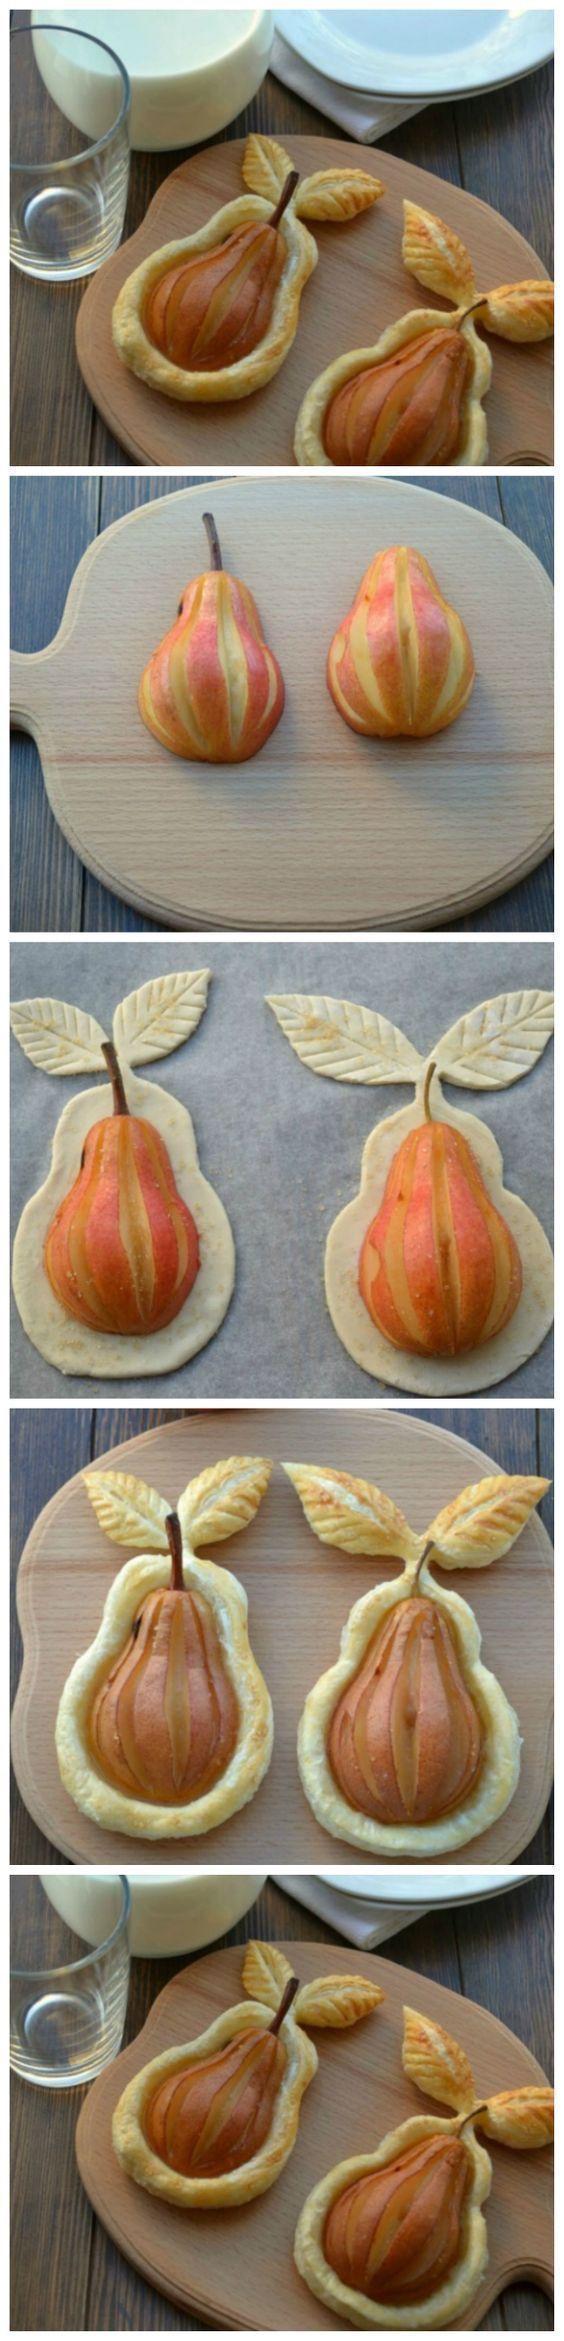 DIY Desserts for Thanksgiving